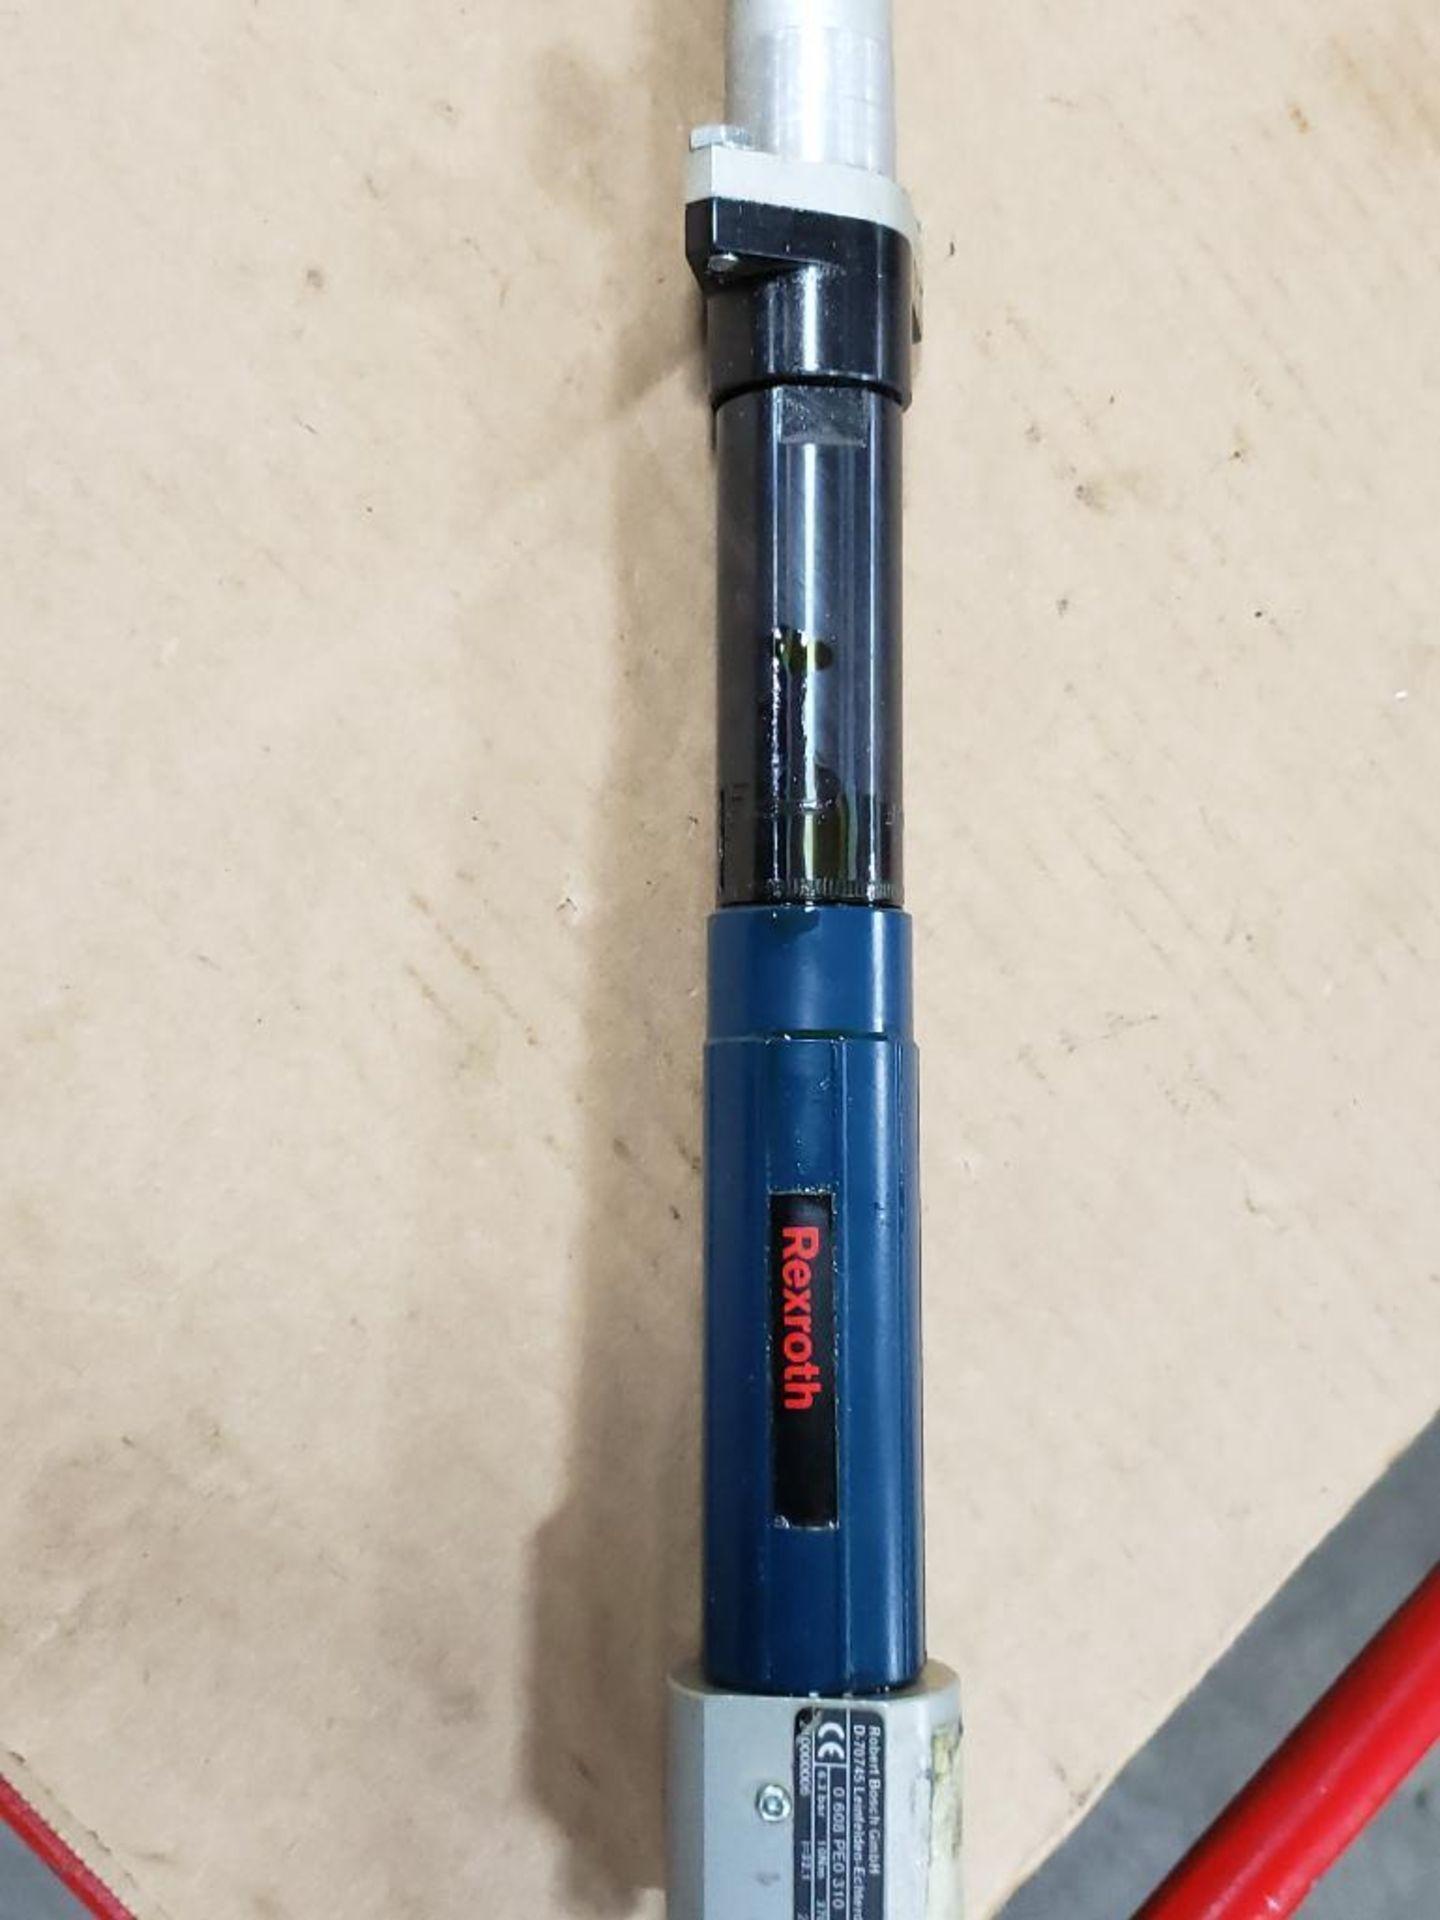 Bosch 0-608-PE0-310 Nutrunner. - Image 3 of 8